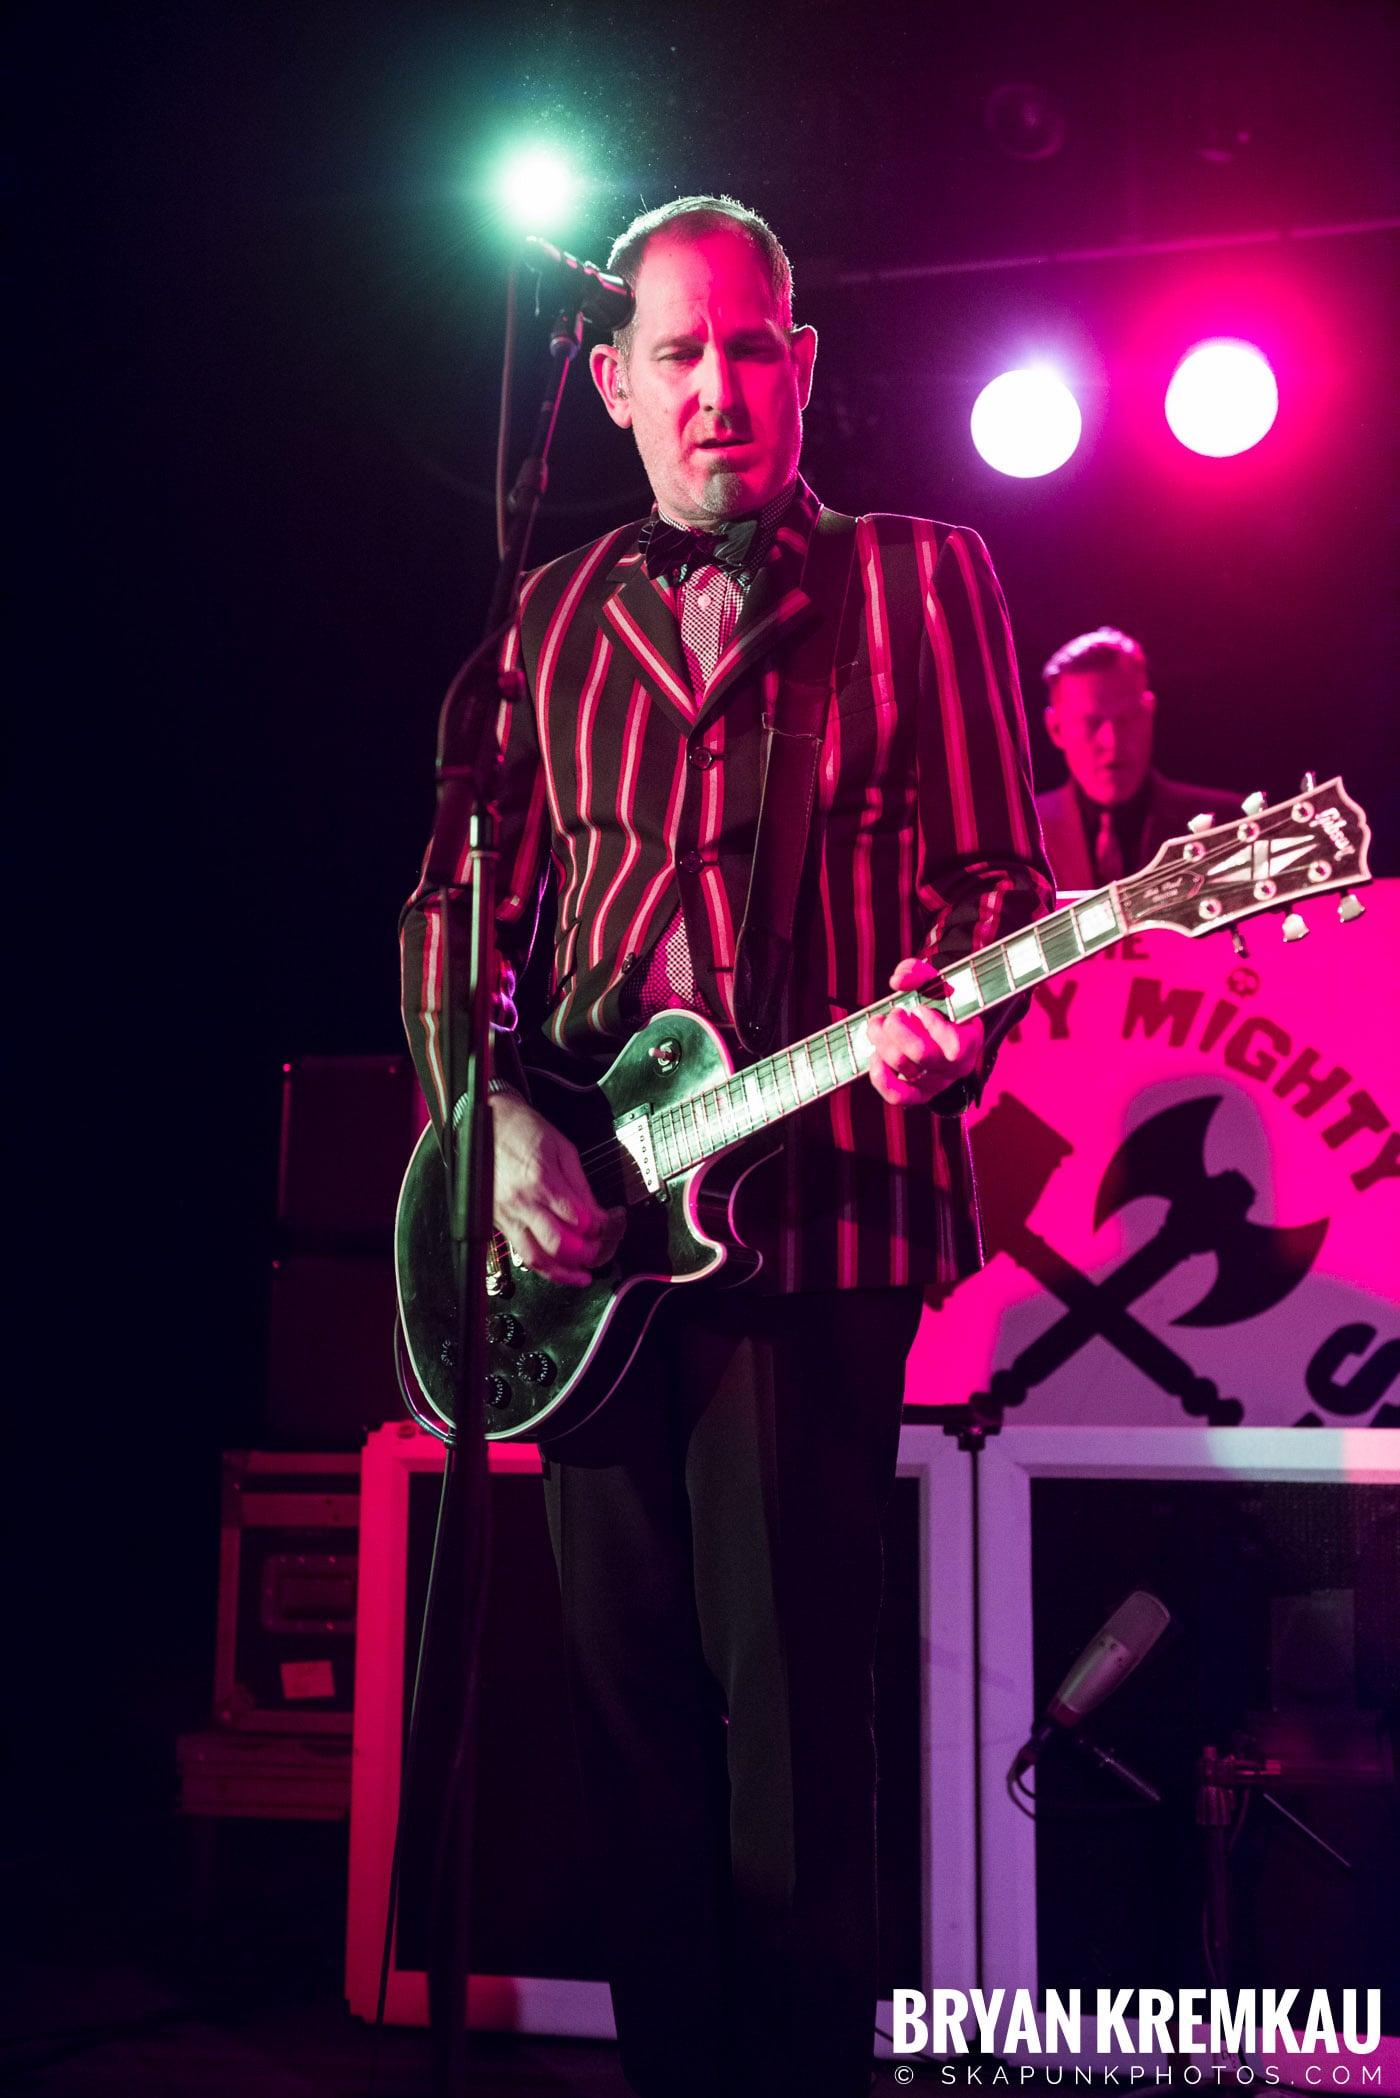 Mighty Mighty Bosstones @ Starland Ballroom, Sayreville, NJ - 7.29.17 (5)